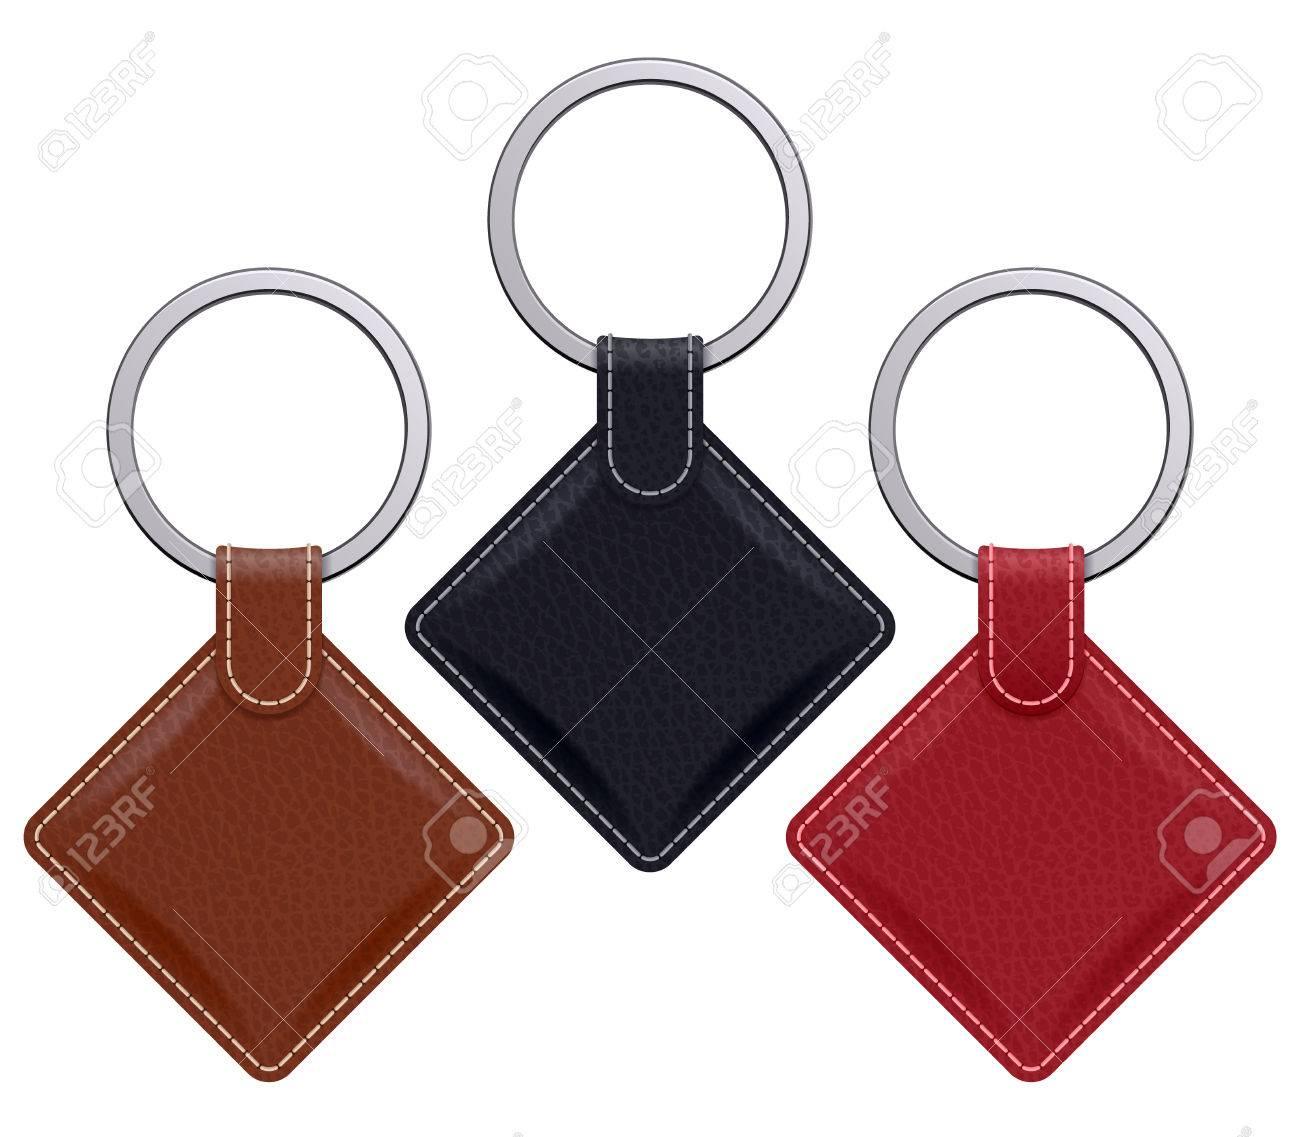 realistic keychains pendants templates set square leather designs